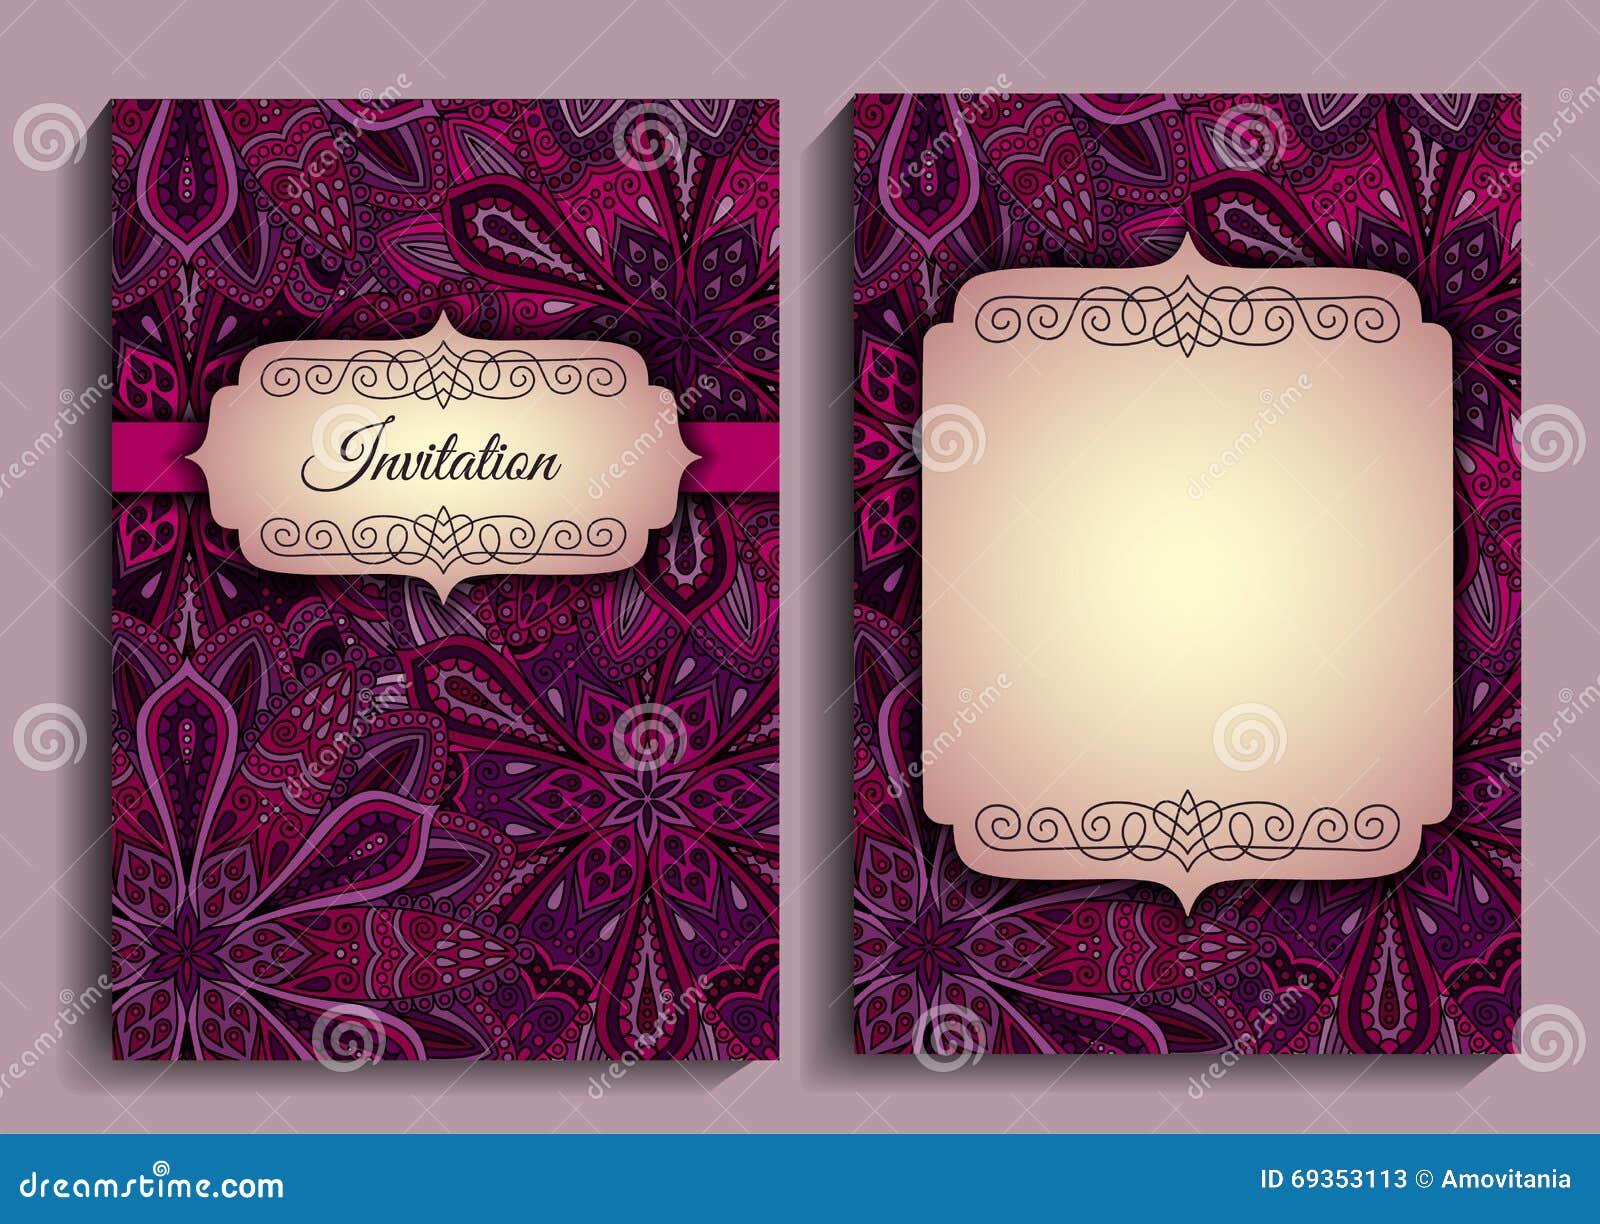 89854394fb92 Purple vintage flower invitation vector elegant template intricate floral  pattern frames swirl decorative jpg 1300x1011 Purple